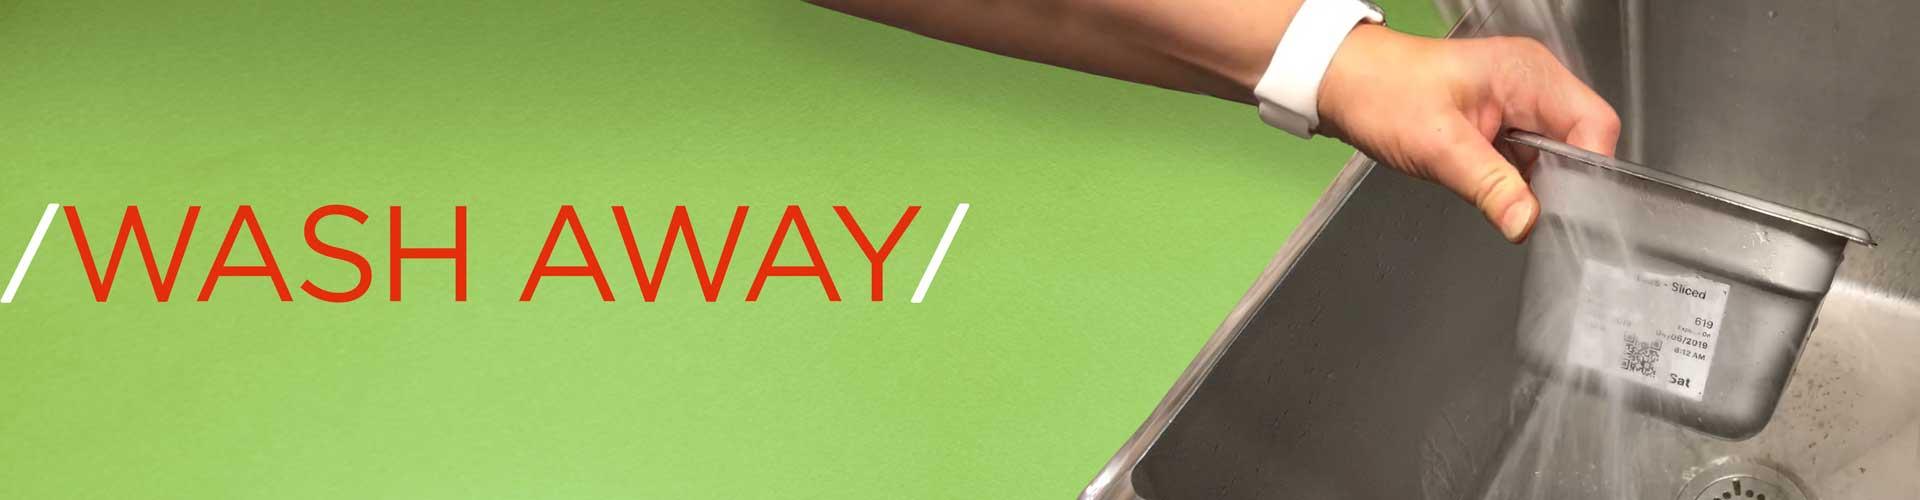 wash-away-2.jpg